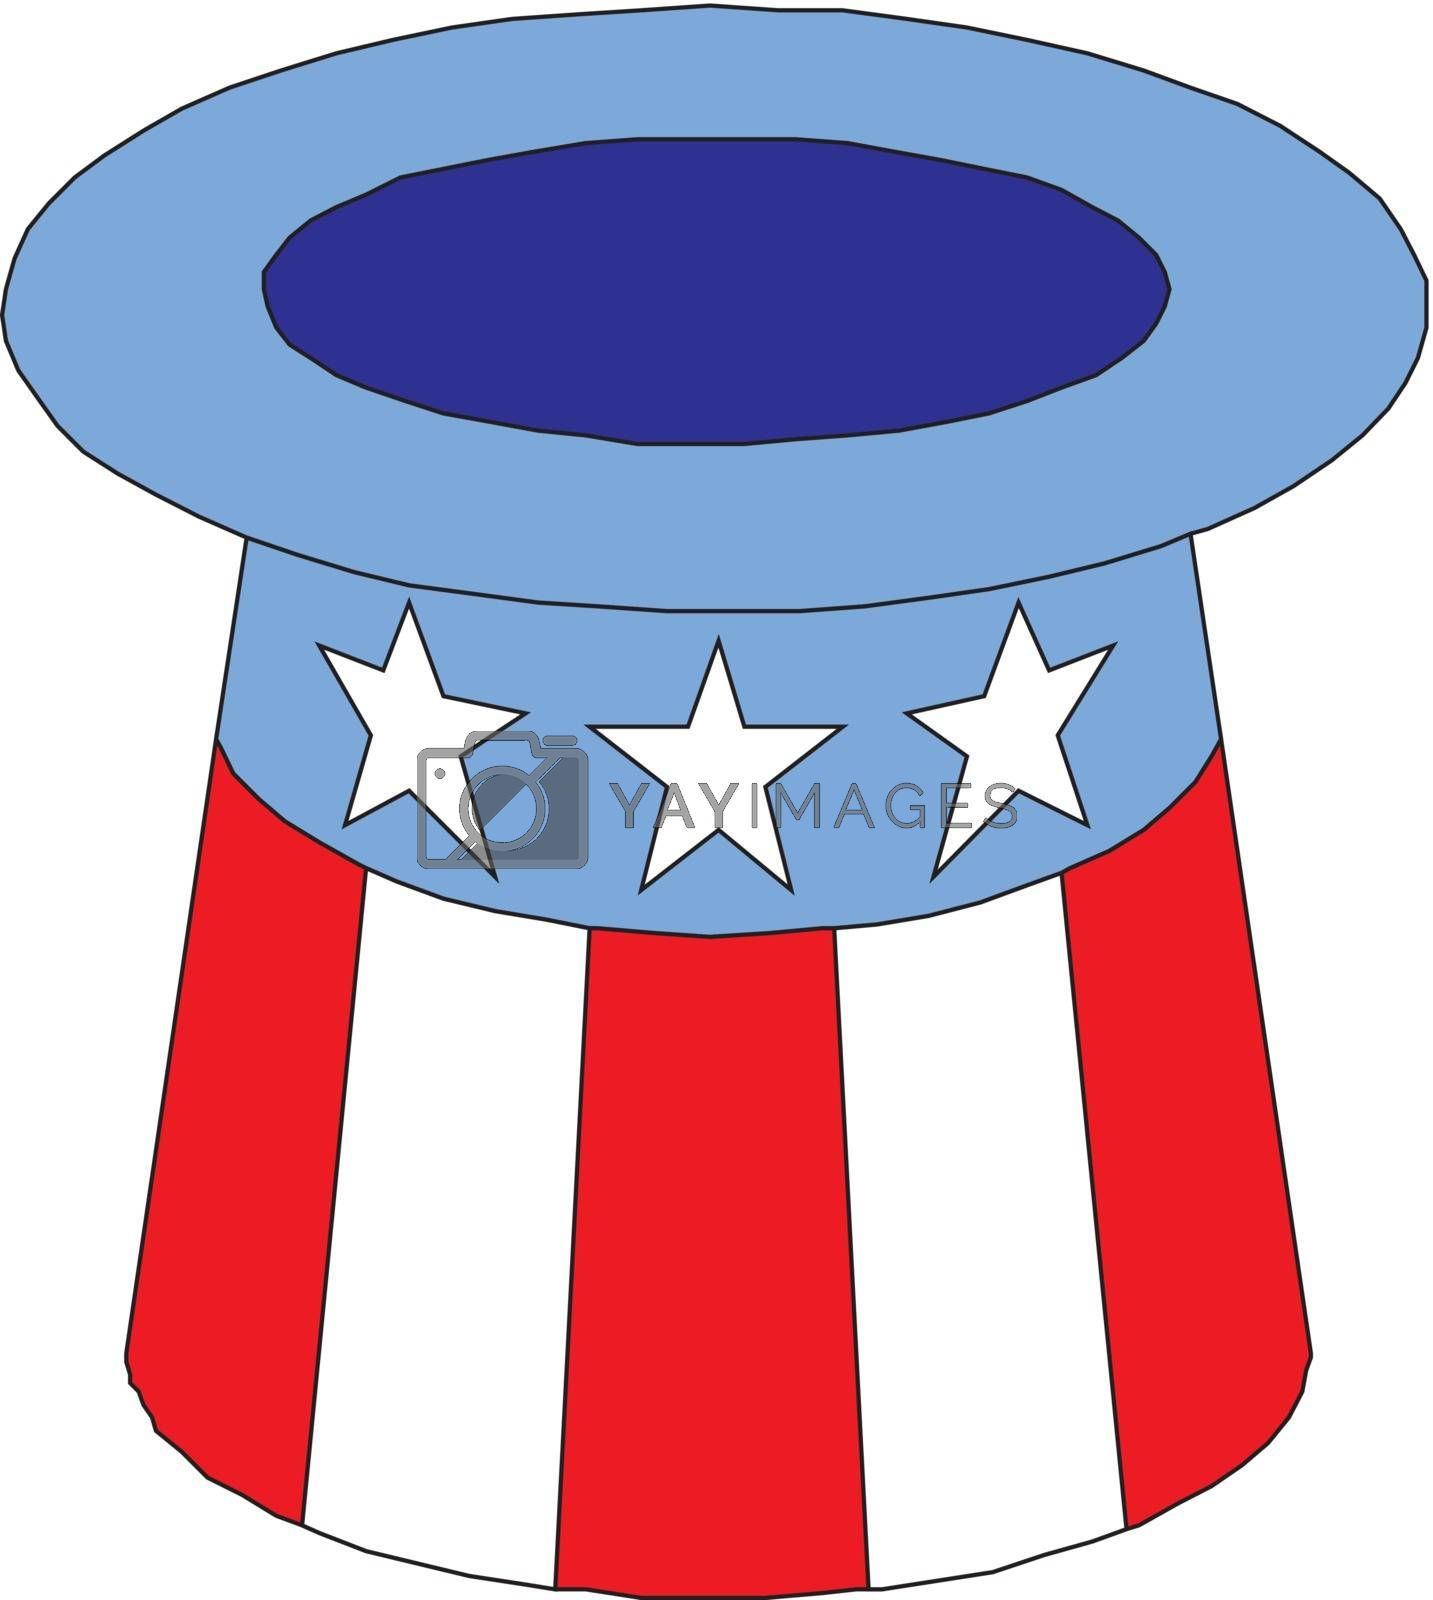 4 of July celebration hat icon.